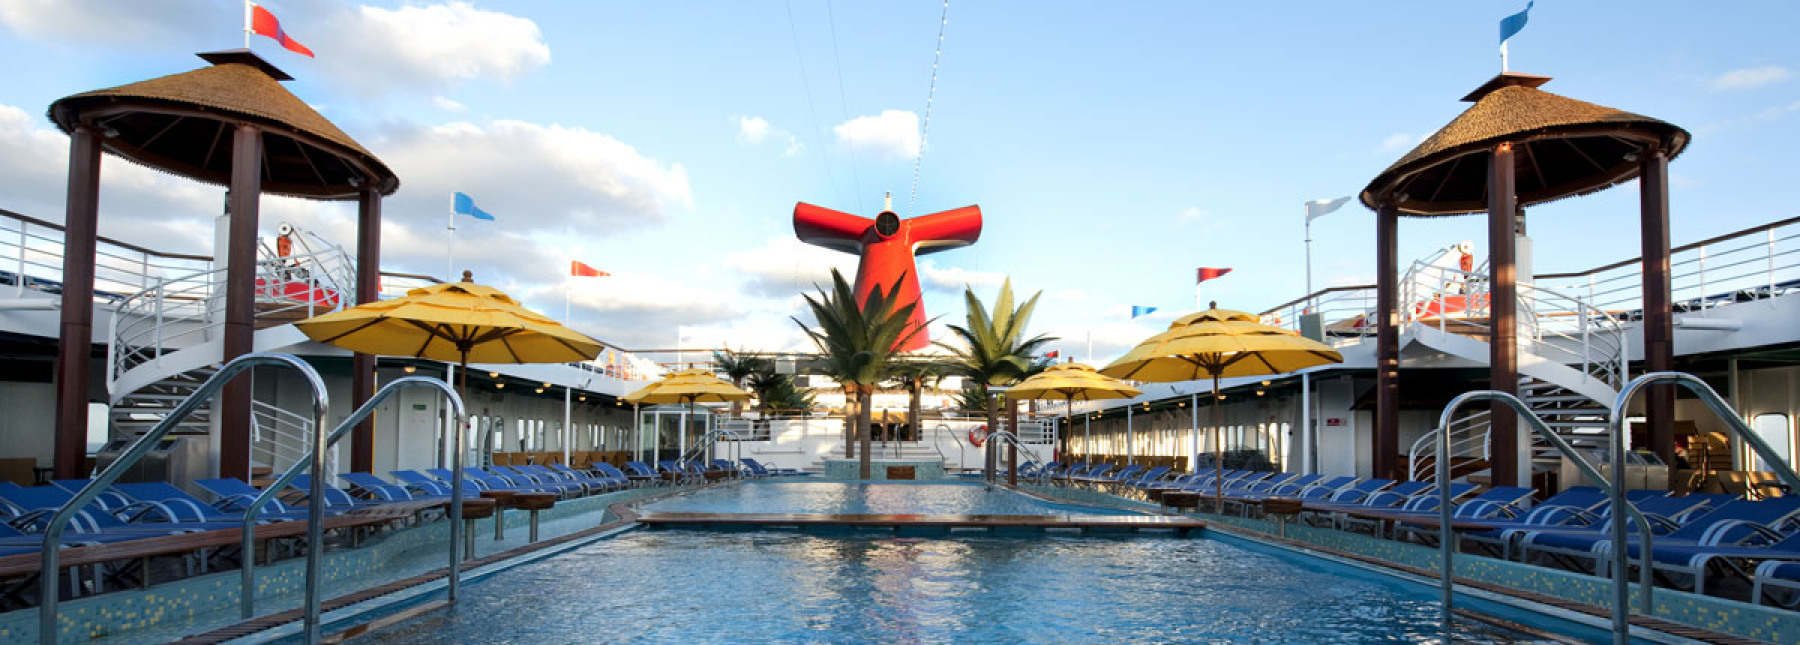 Carnival Cruise Line Carnival Valor pools-2.jpg